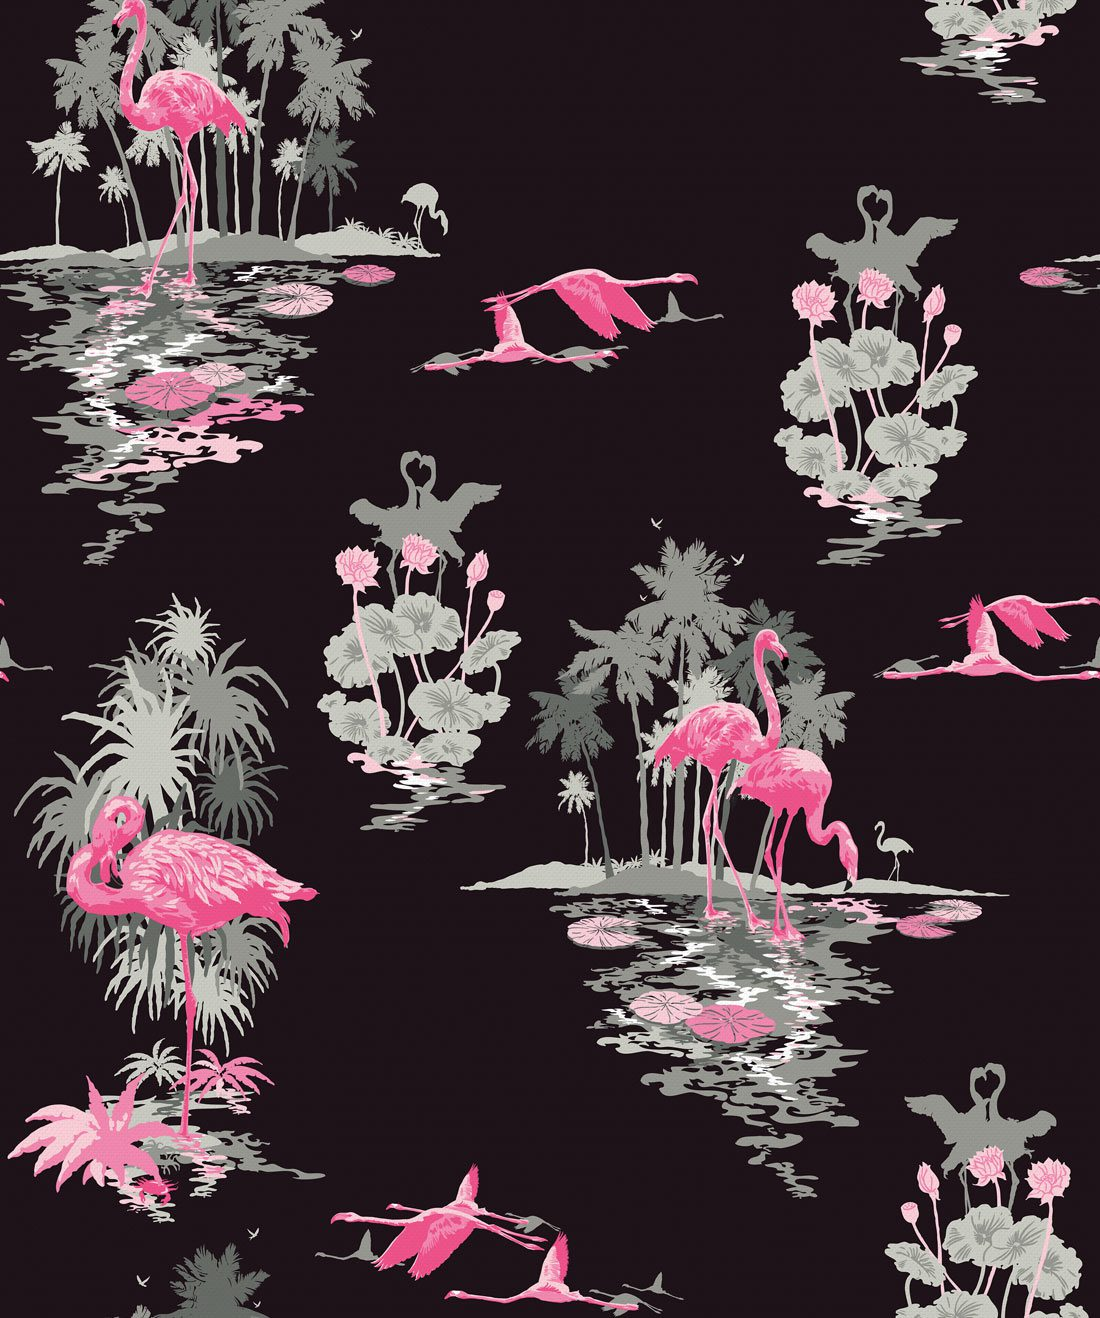 Flamingo Night Wallpaper